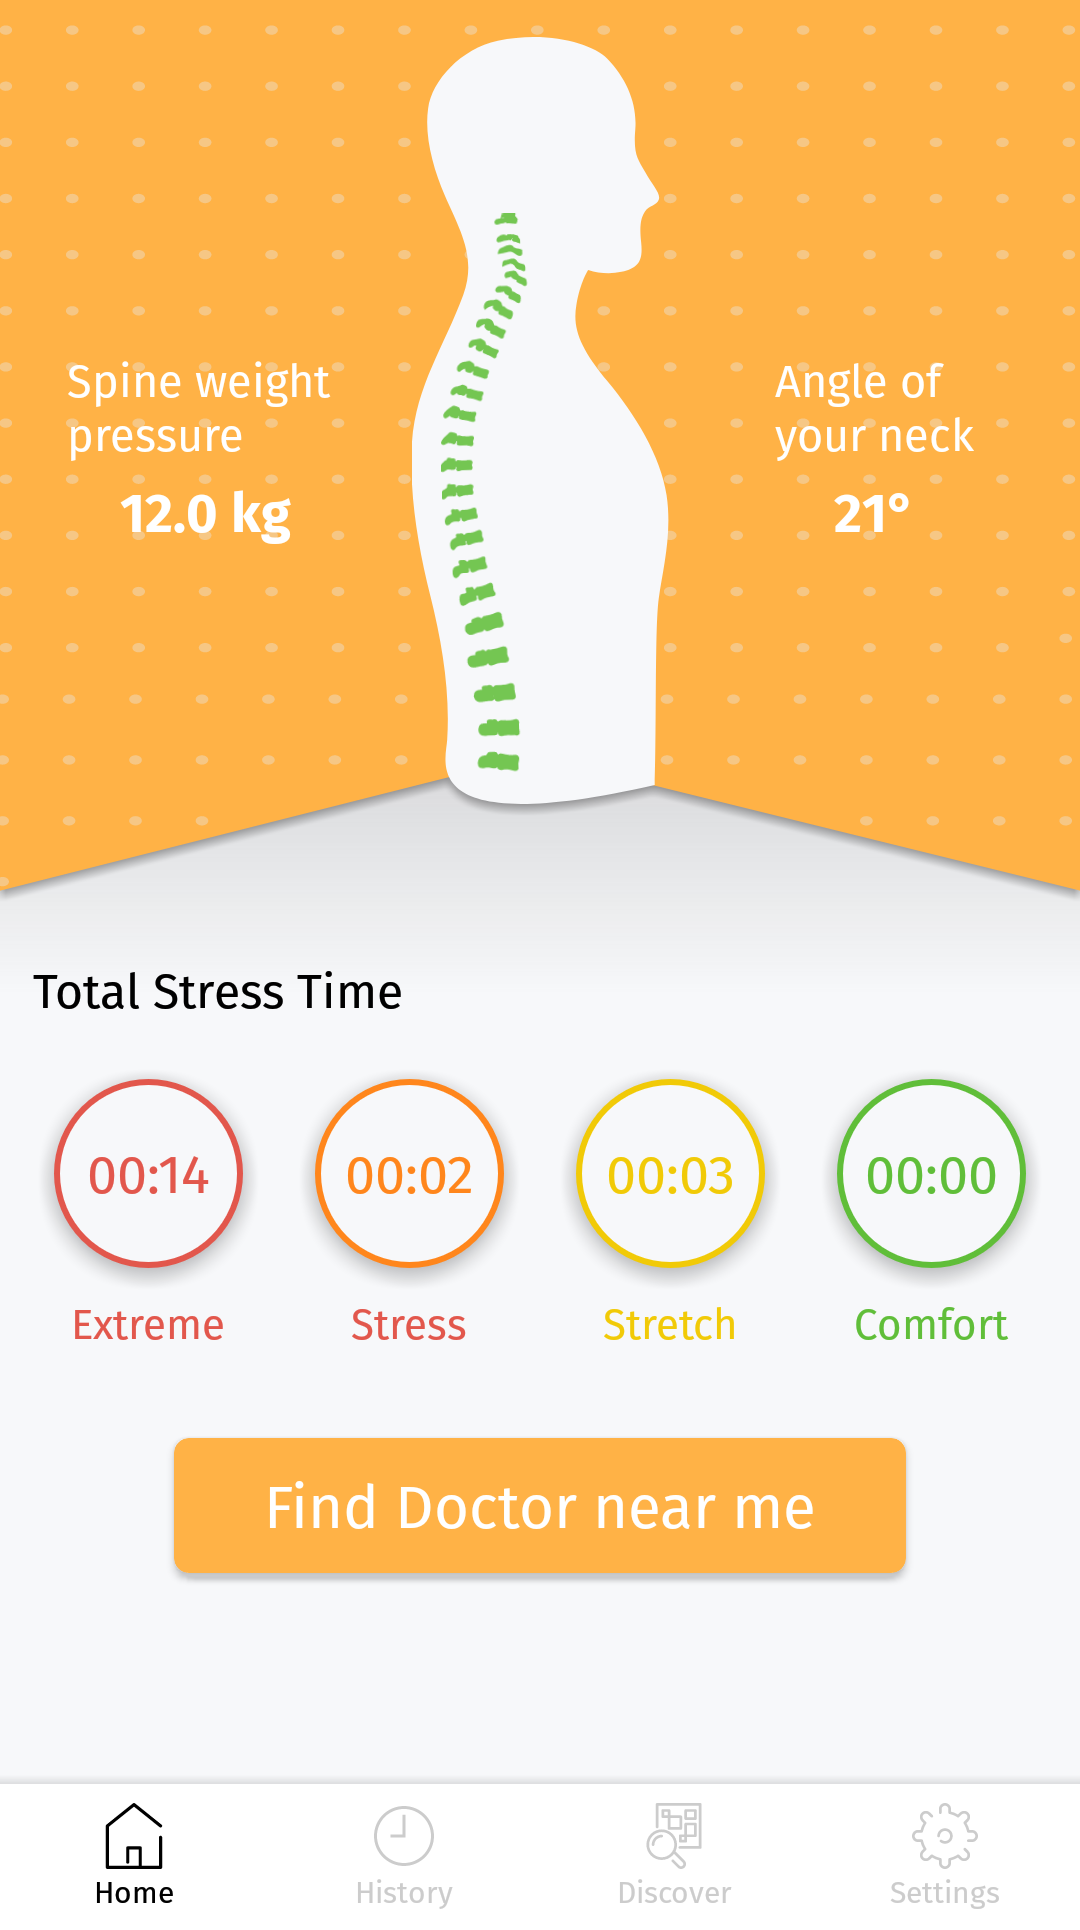 Neck & Spine Wellness